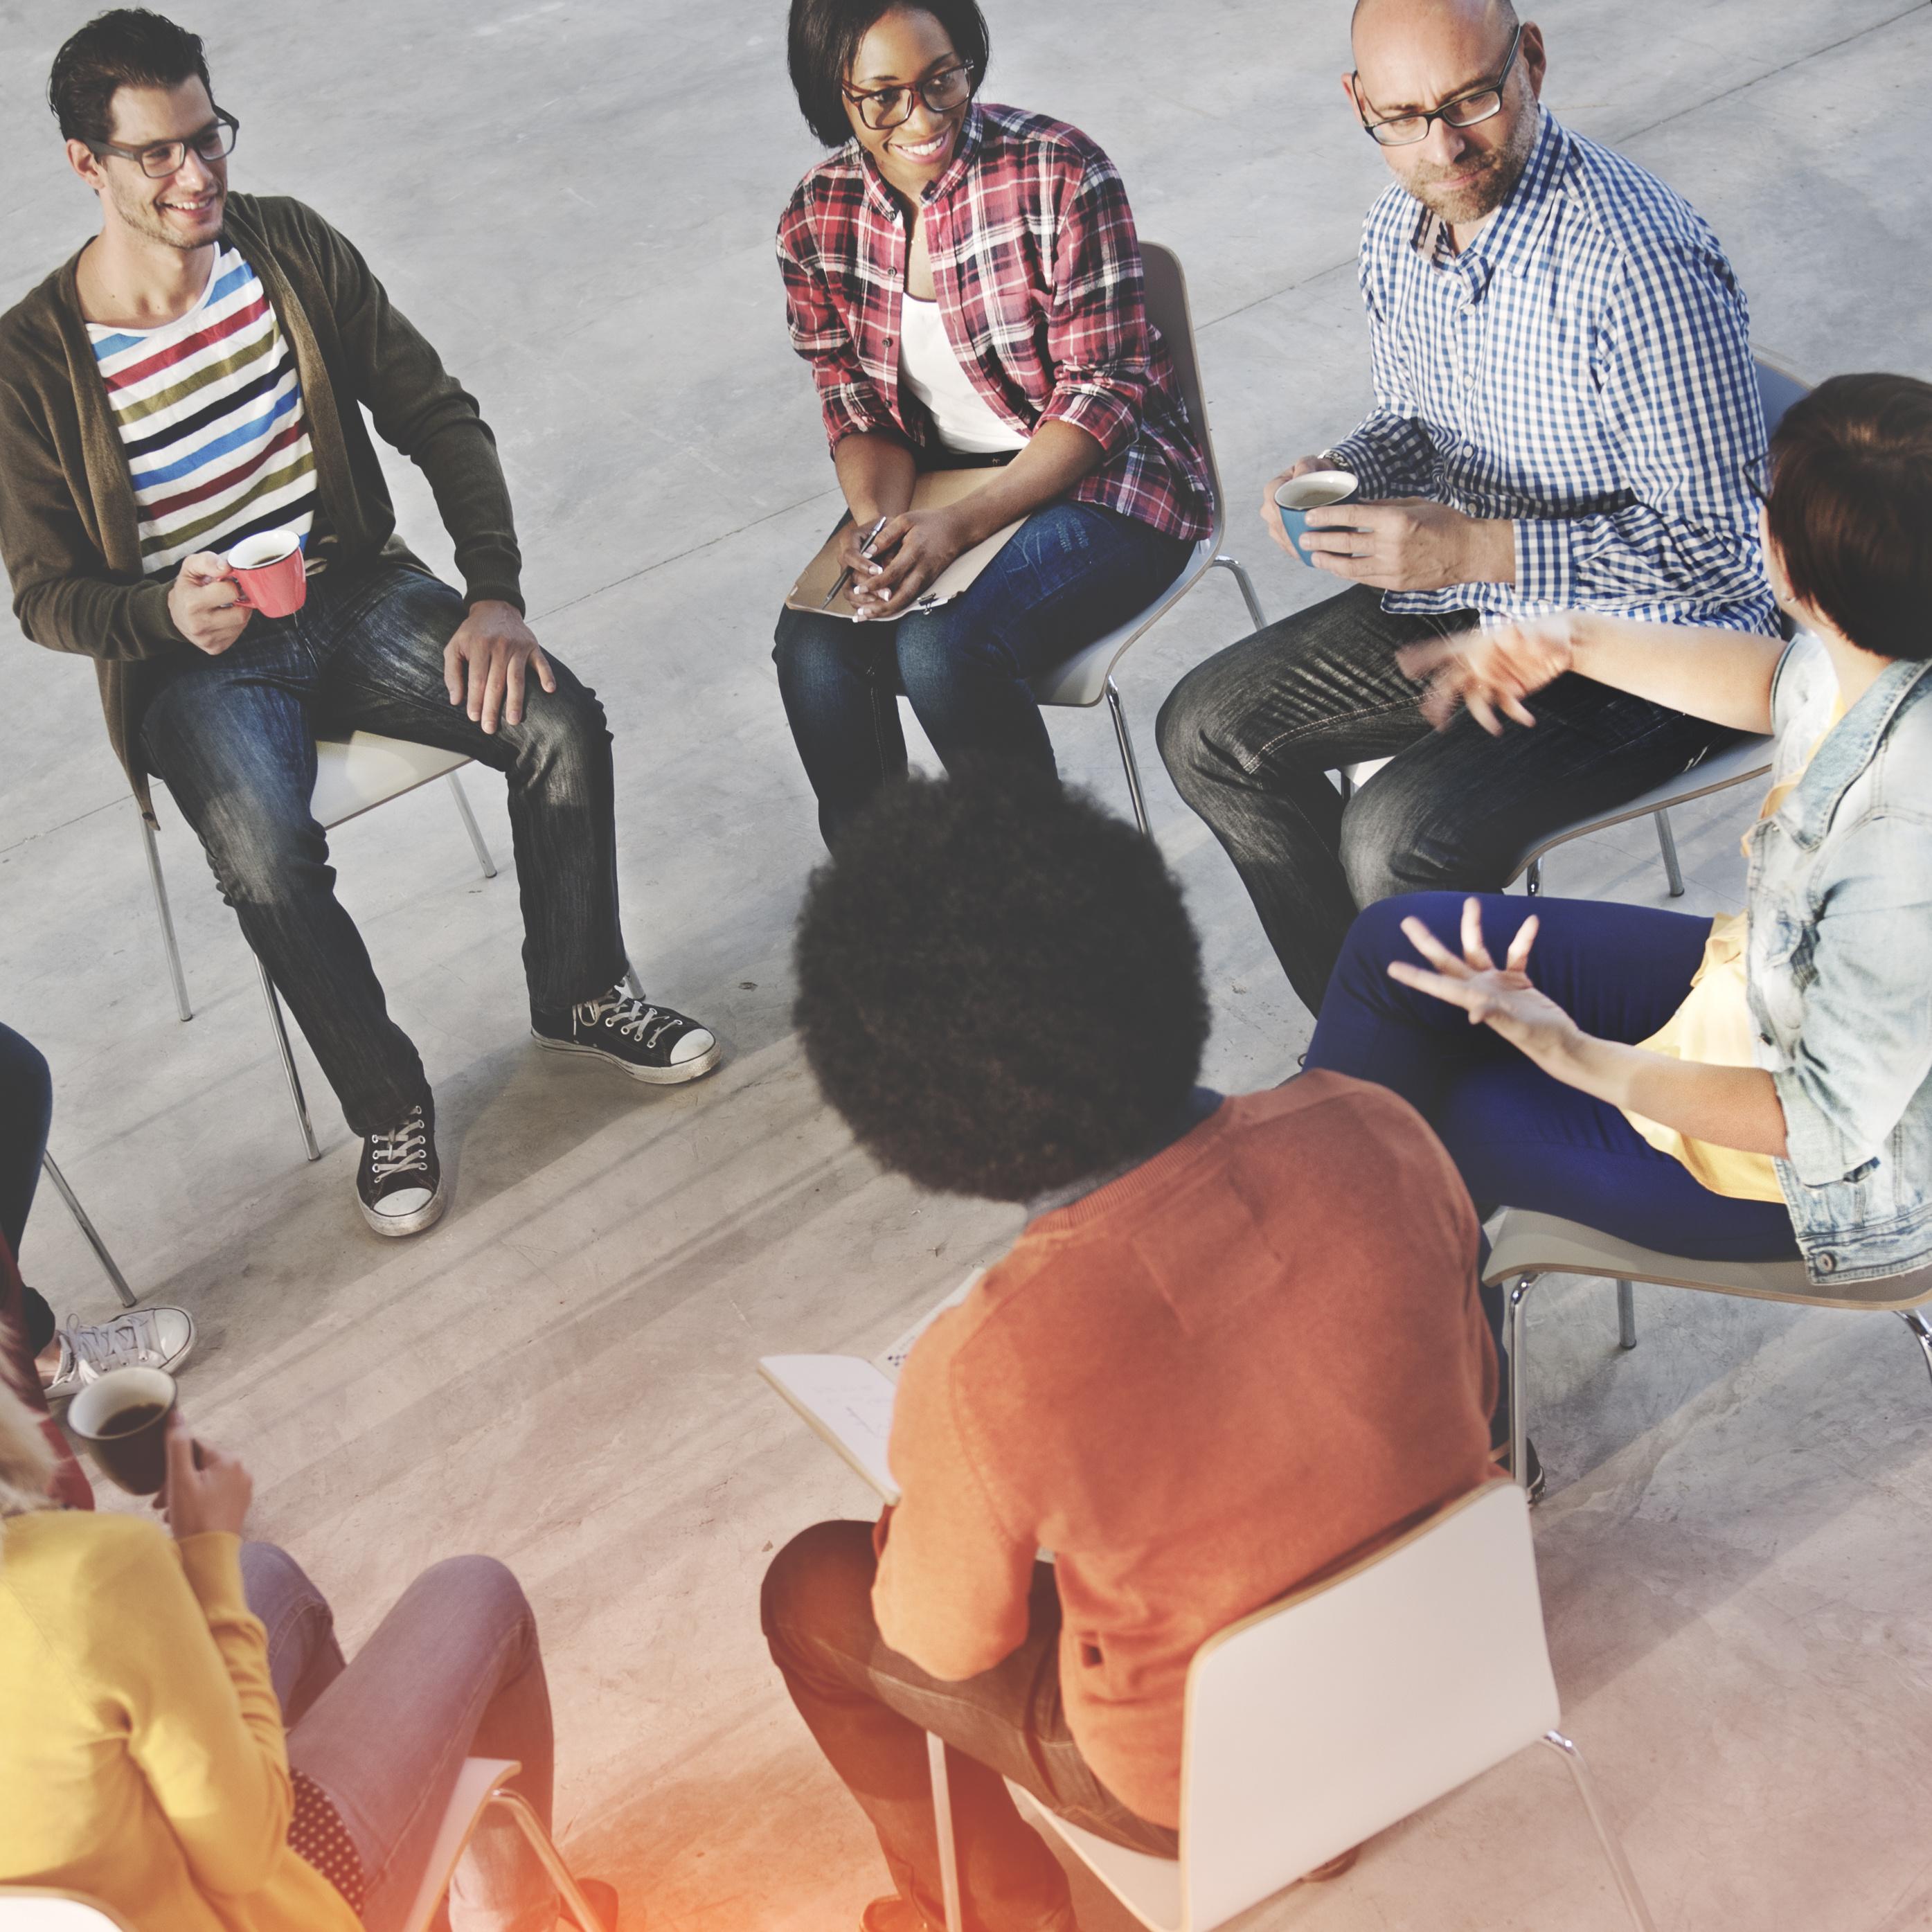 Meeting Brainstorming Sharing Meeting Seminar Concept